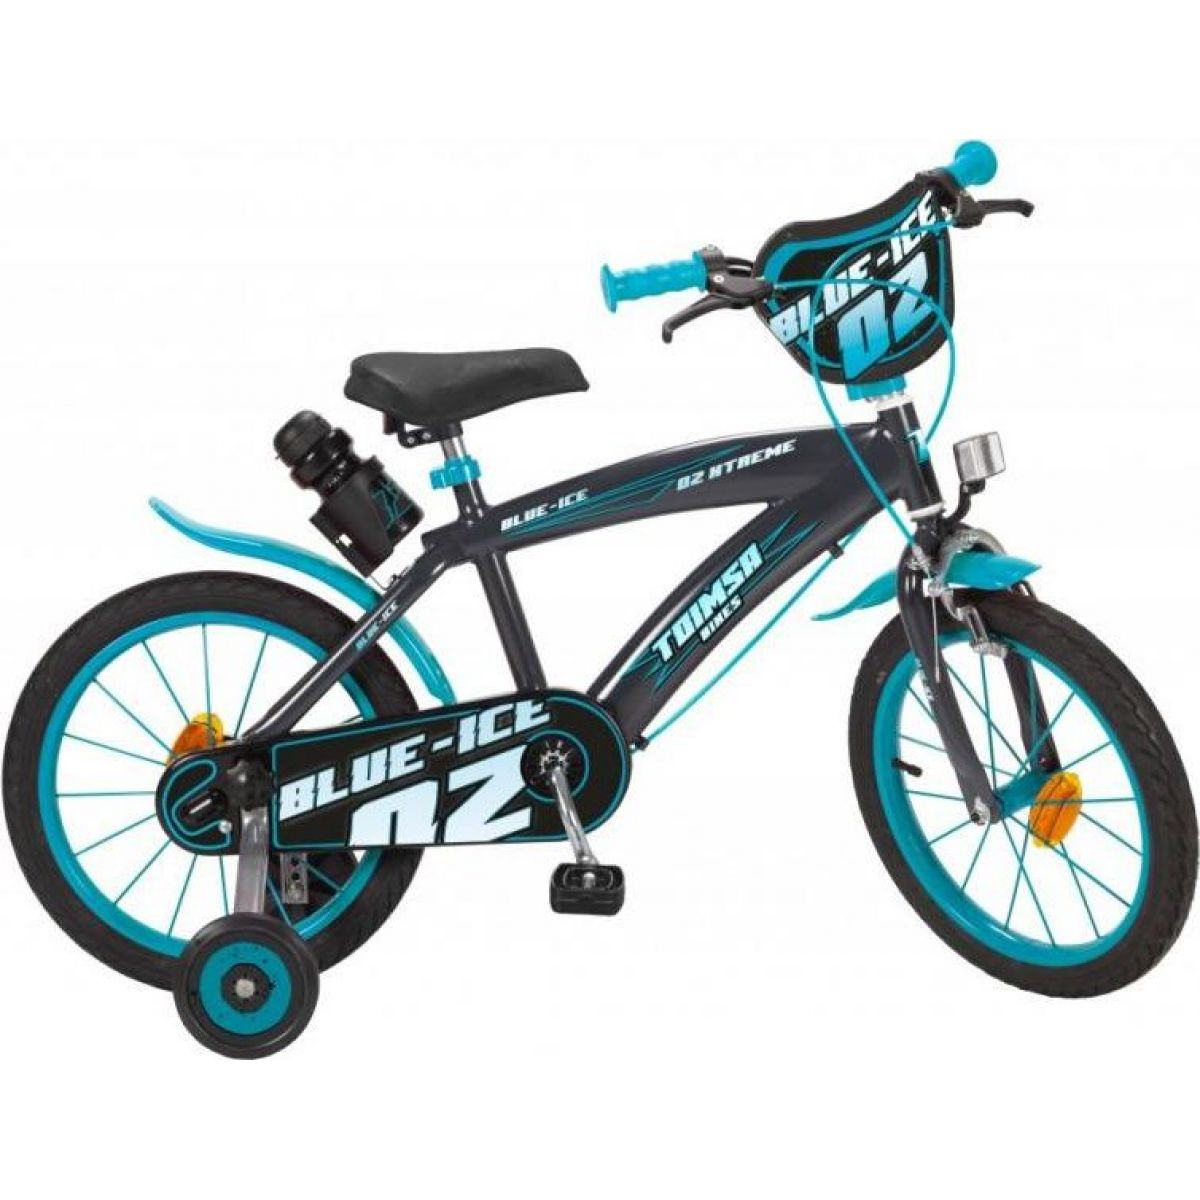 Toimsu Bicykel detské Blue Ice modro čierne 16